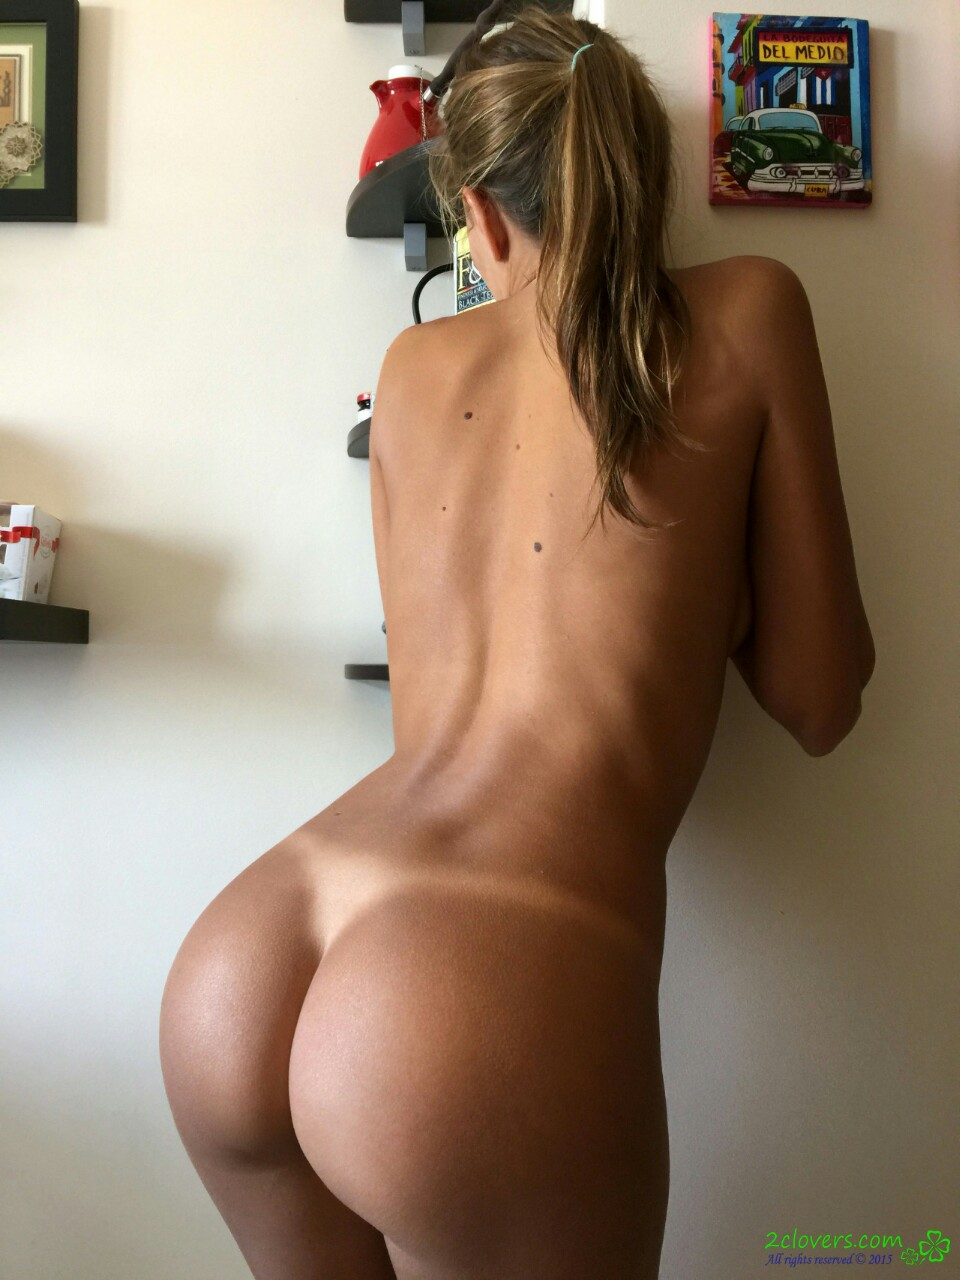 Huge tanned amateur ass